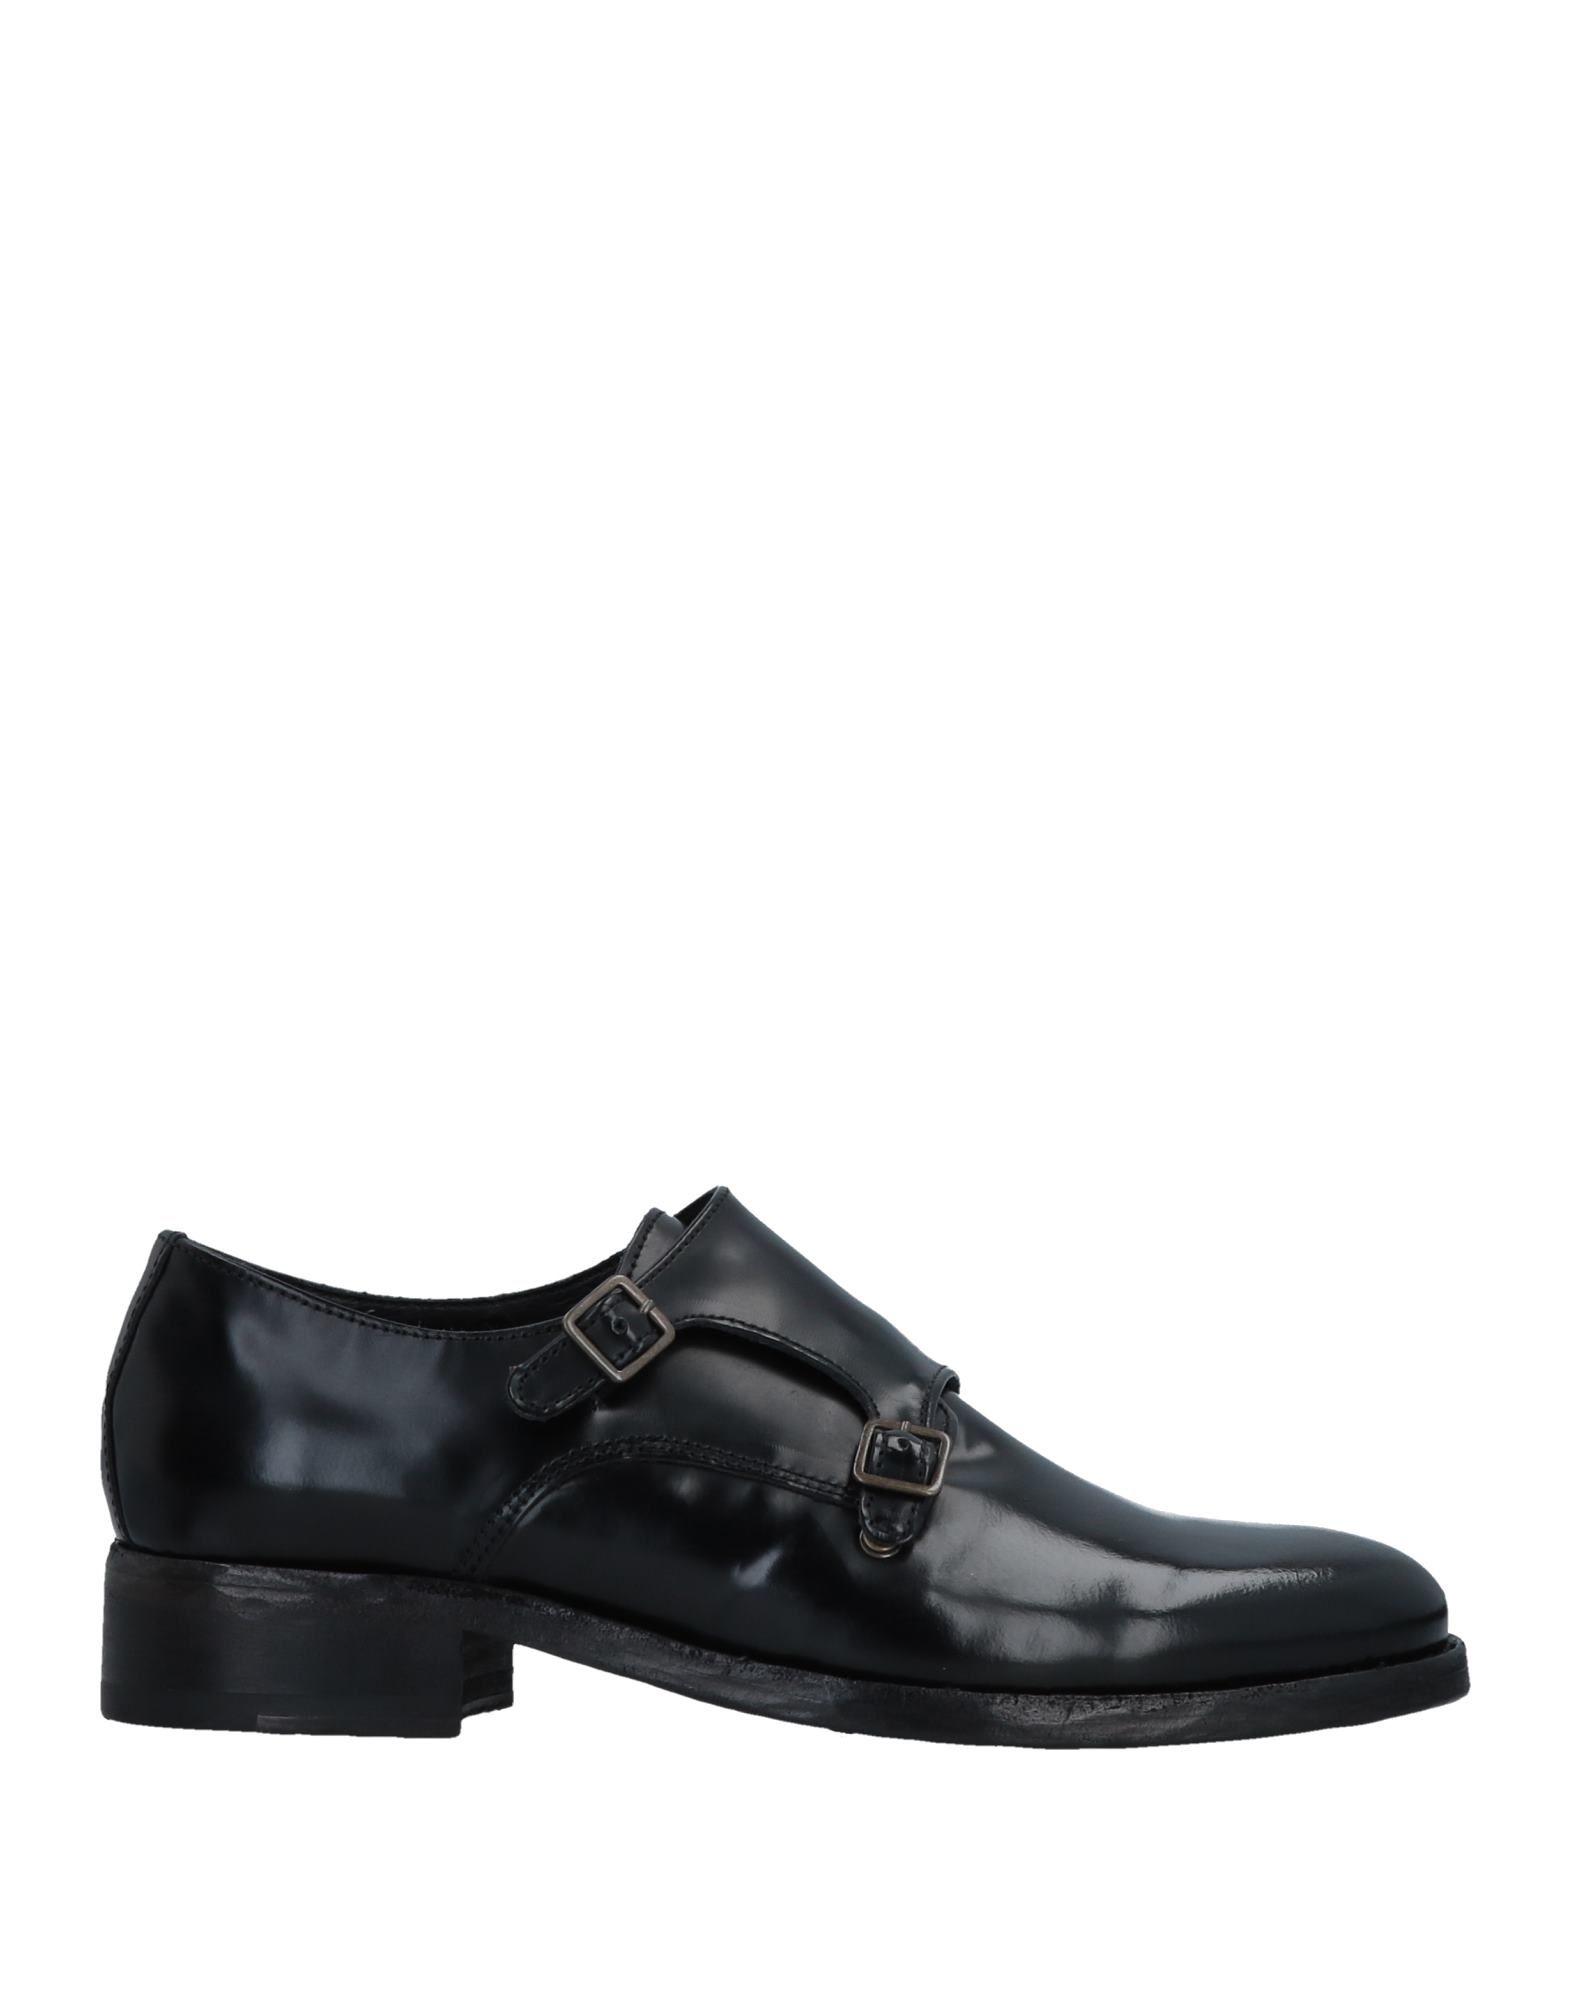 Catarina Martins Mokassins Damen  11507038NI Gute Qualität beliebte Schuhe